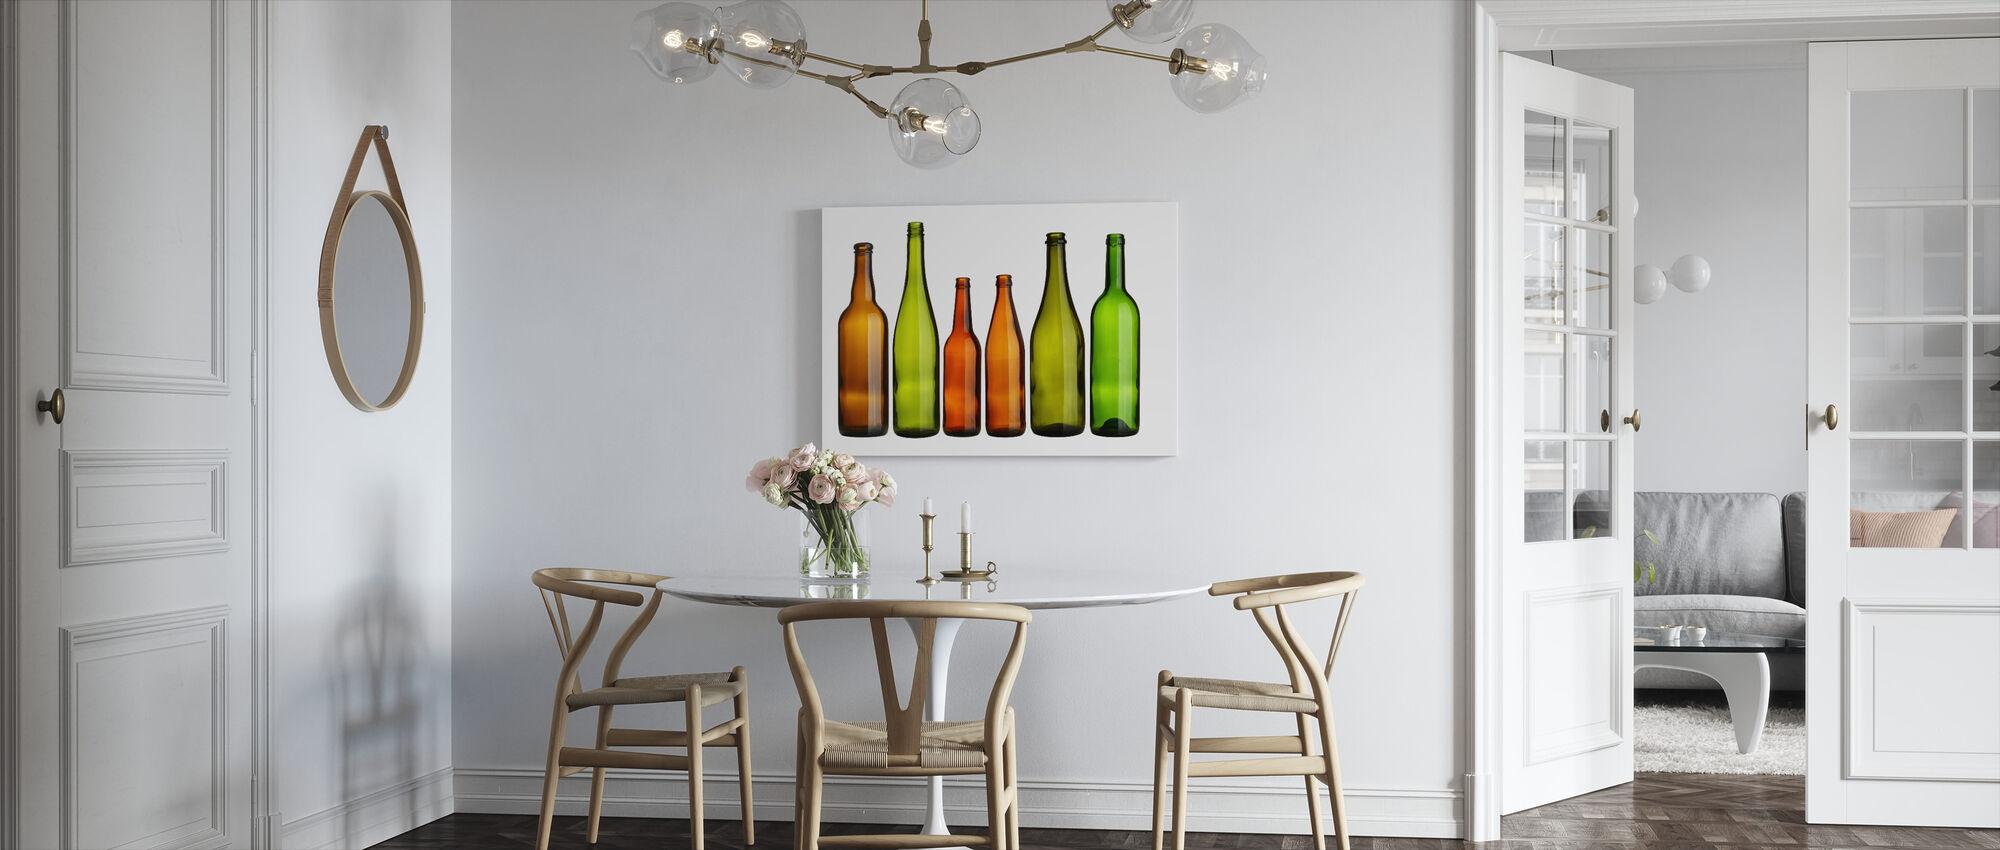 Färgglada flaskor - Canvastavla - Kök